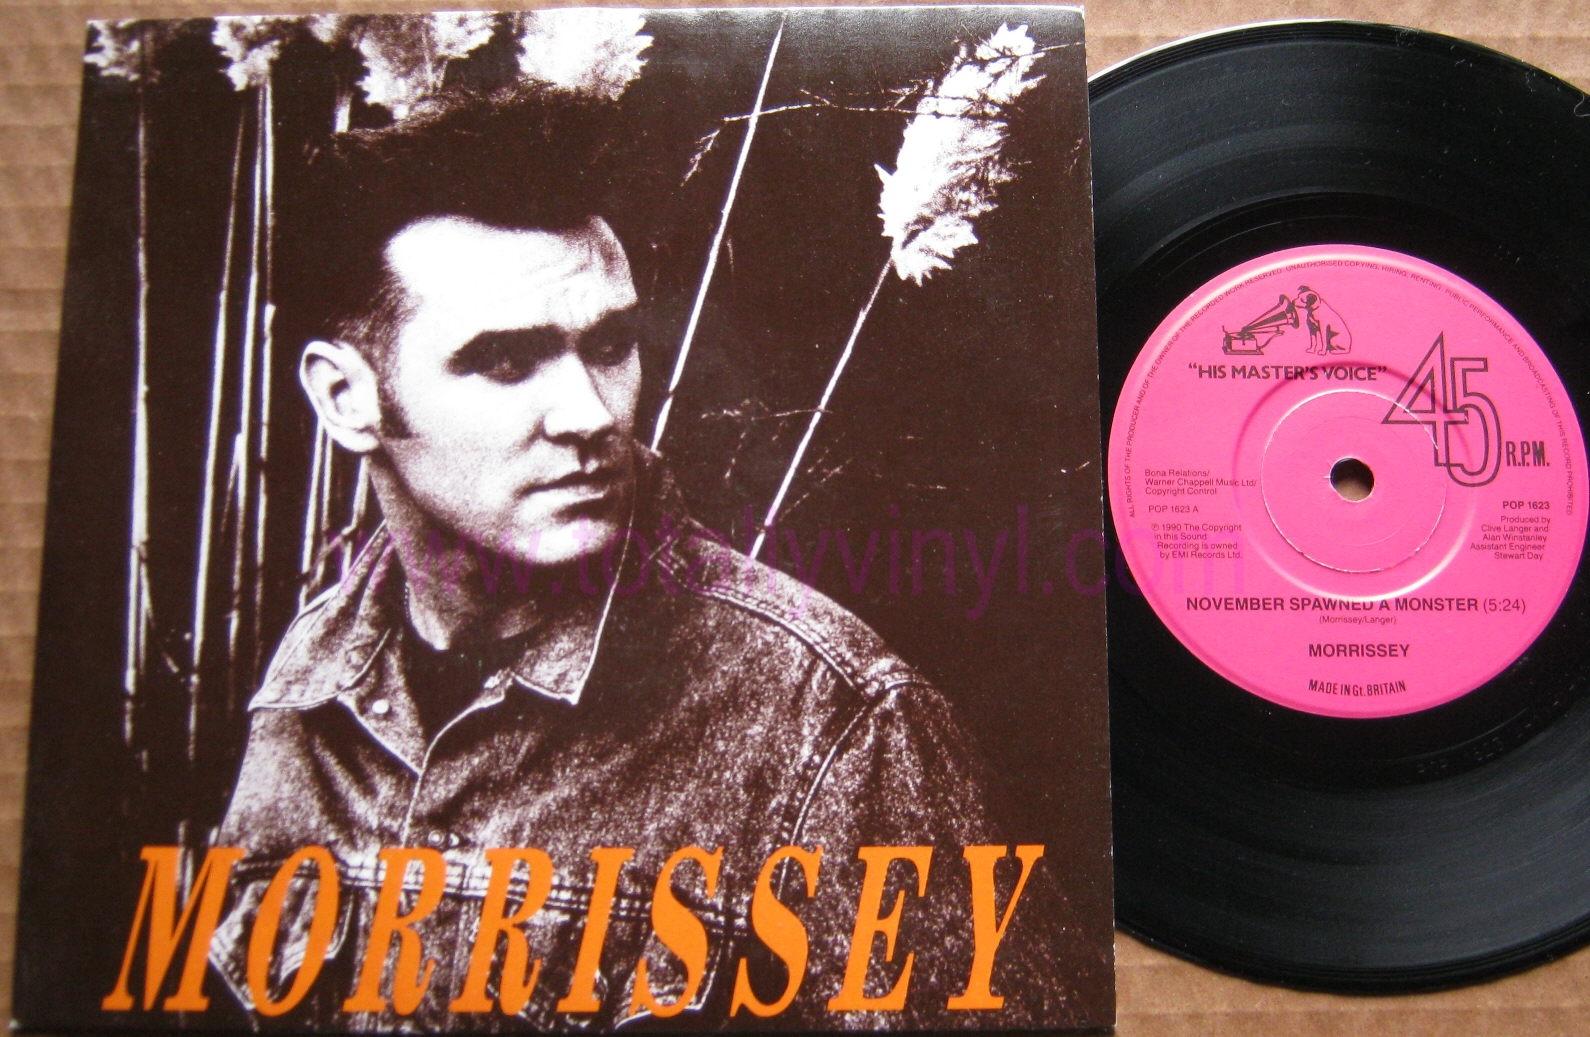 Totally Vinyl Records Morrissey November Spawned A